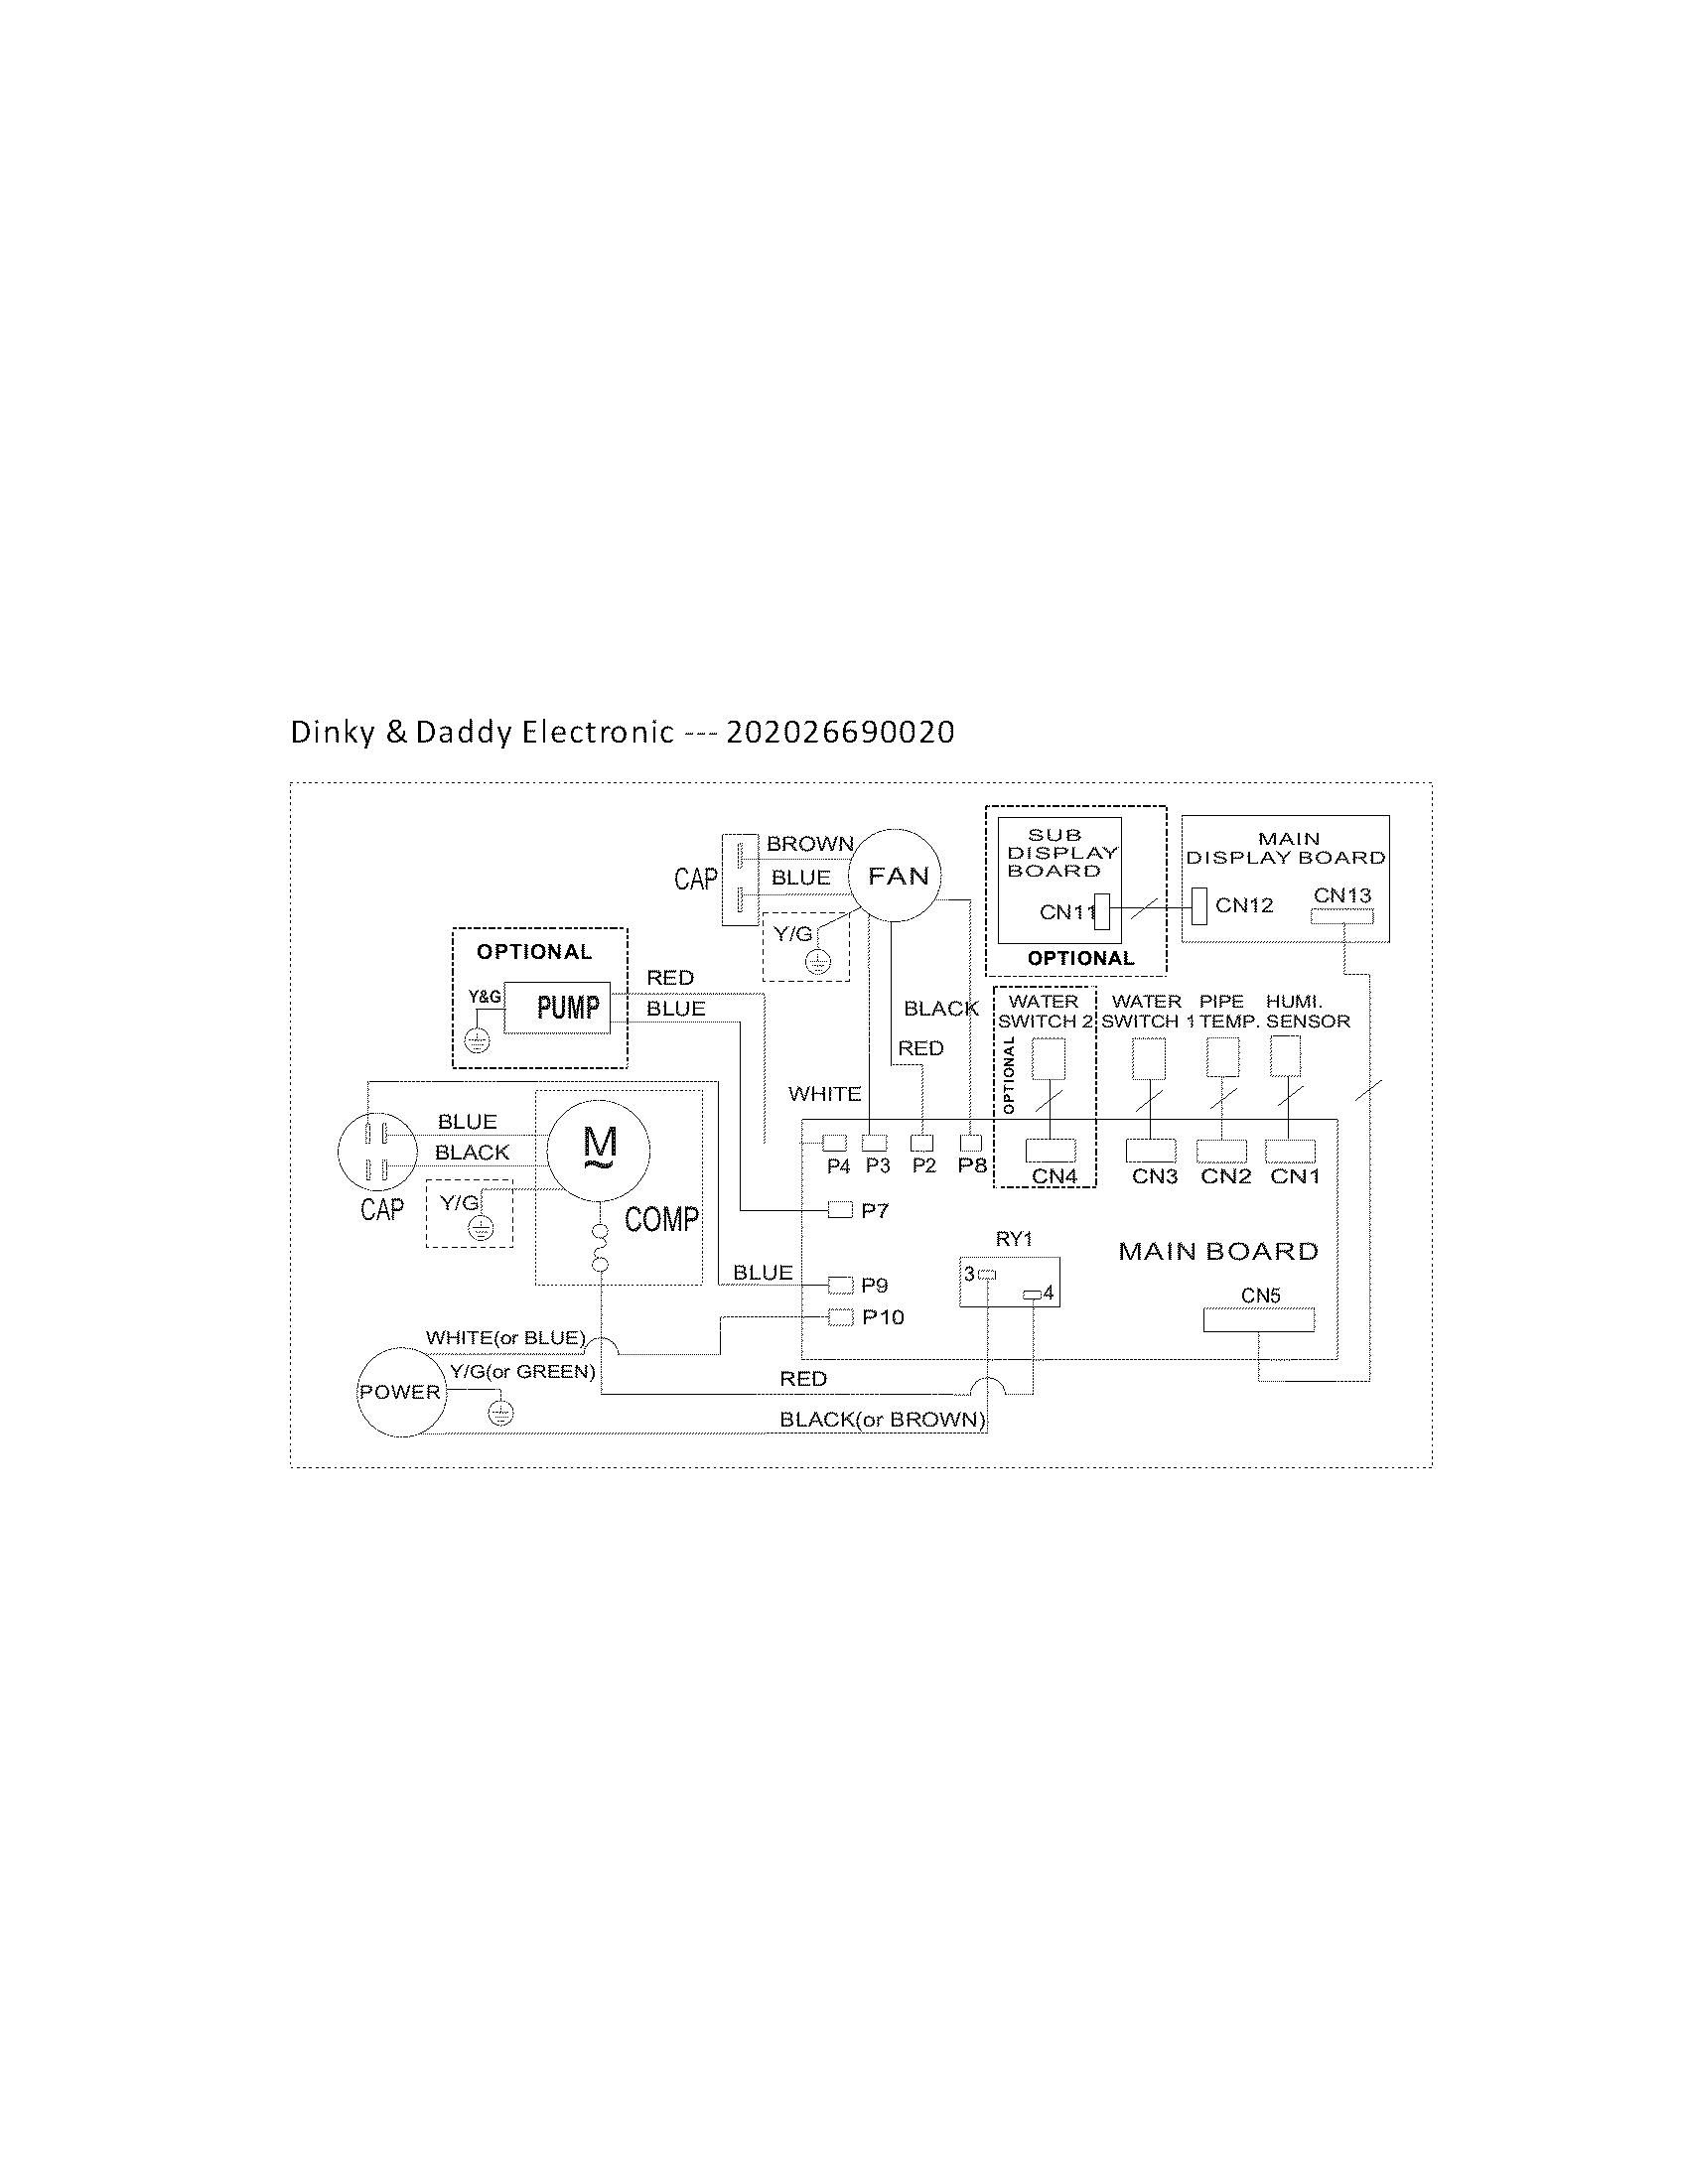 Frigidaire Dehumidifier Wiring Diagram Lad704 Dul